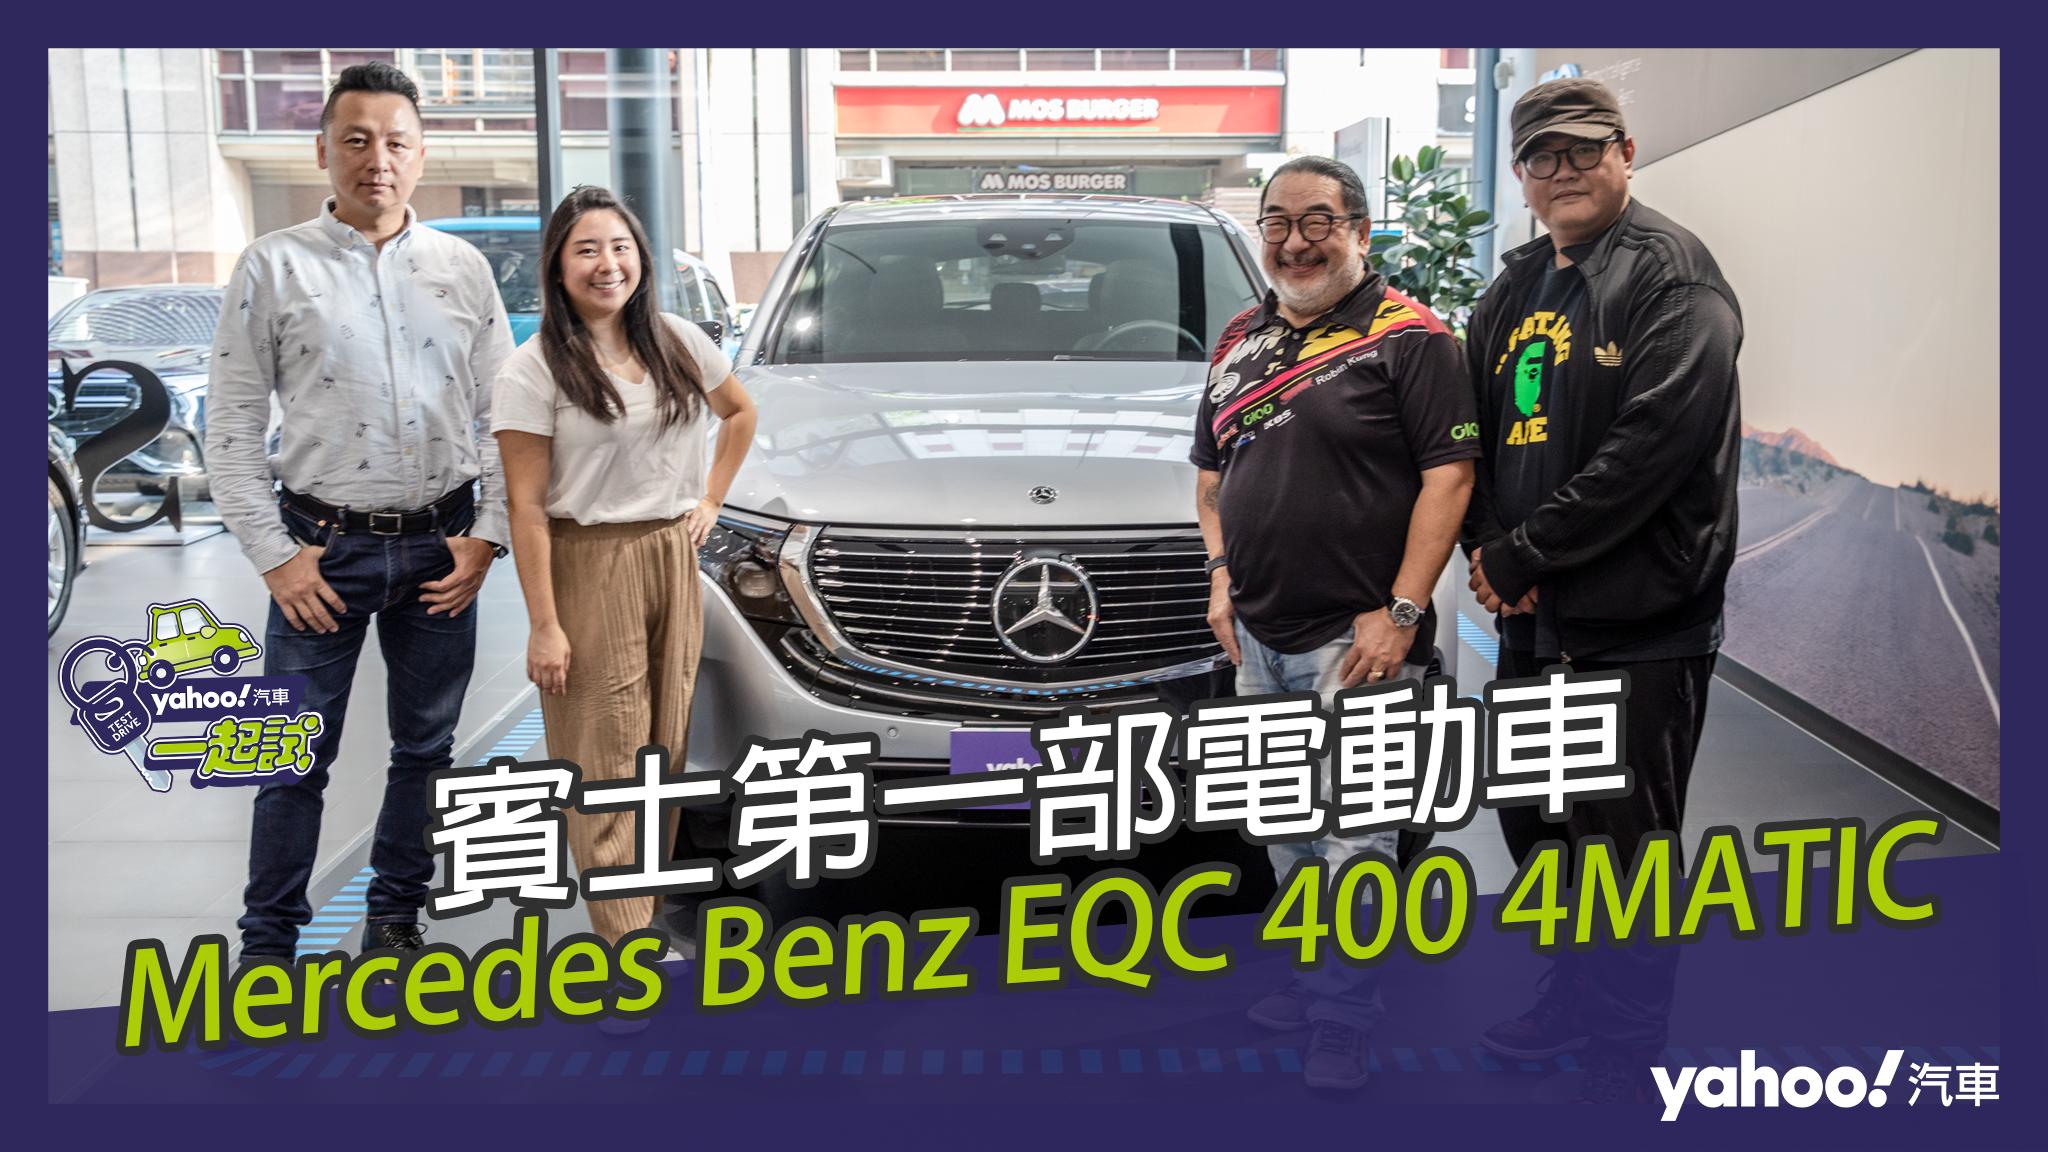 【Yahoo汽車一起試】Vol.17 顛覆你對電動車的想像!深入體驗Mercedes Benz EQC 賓士首輛電動車